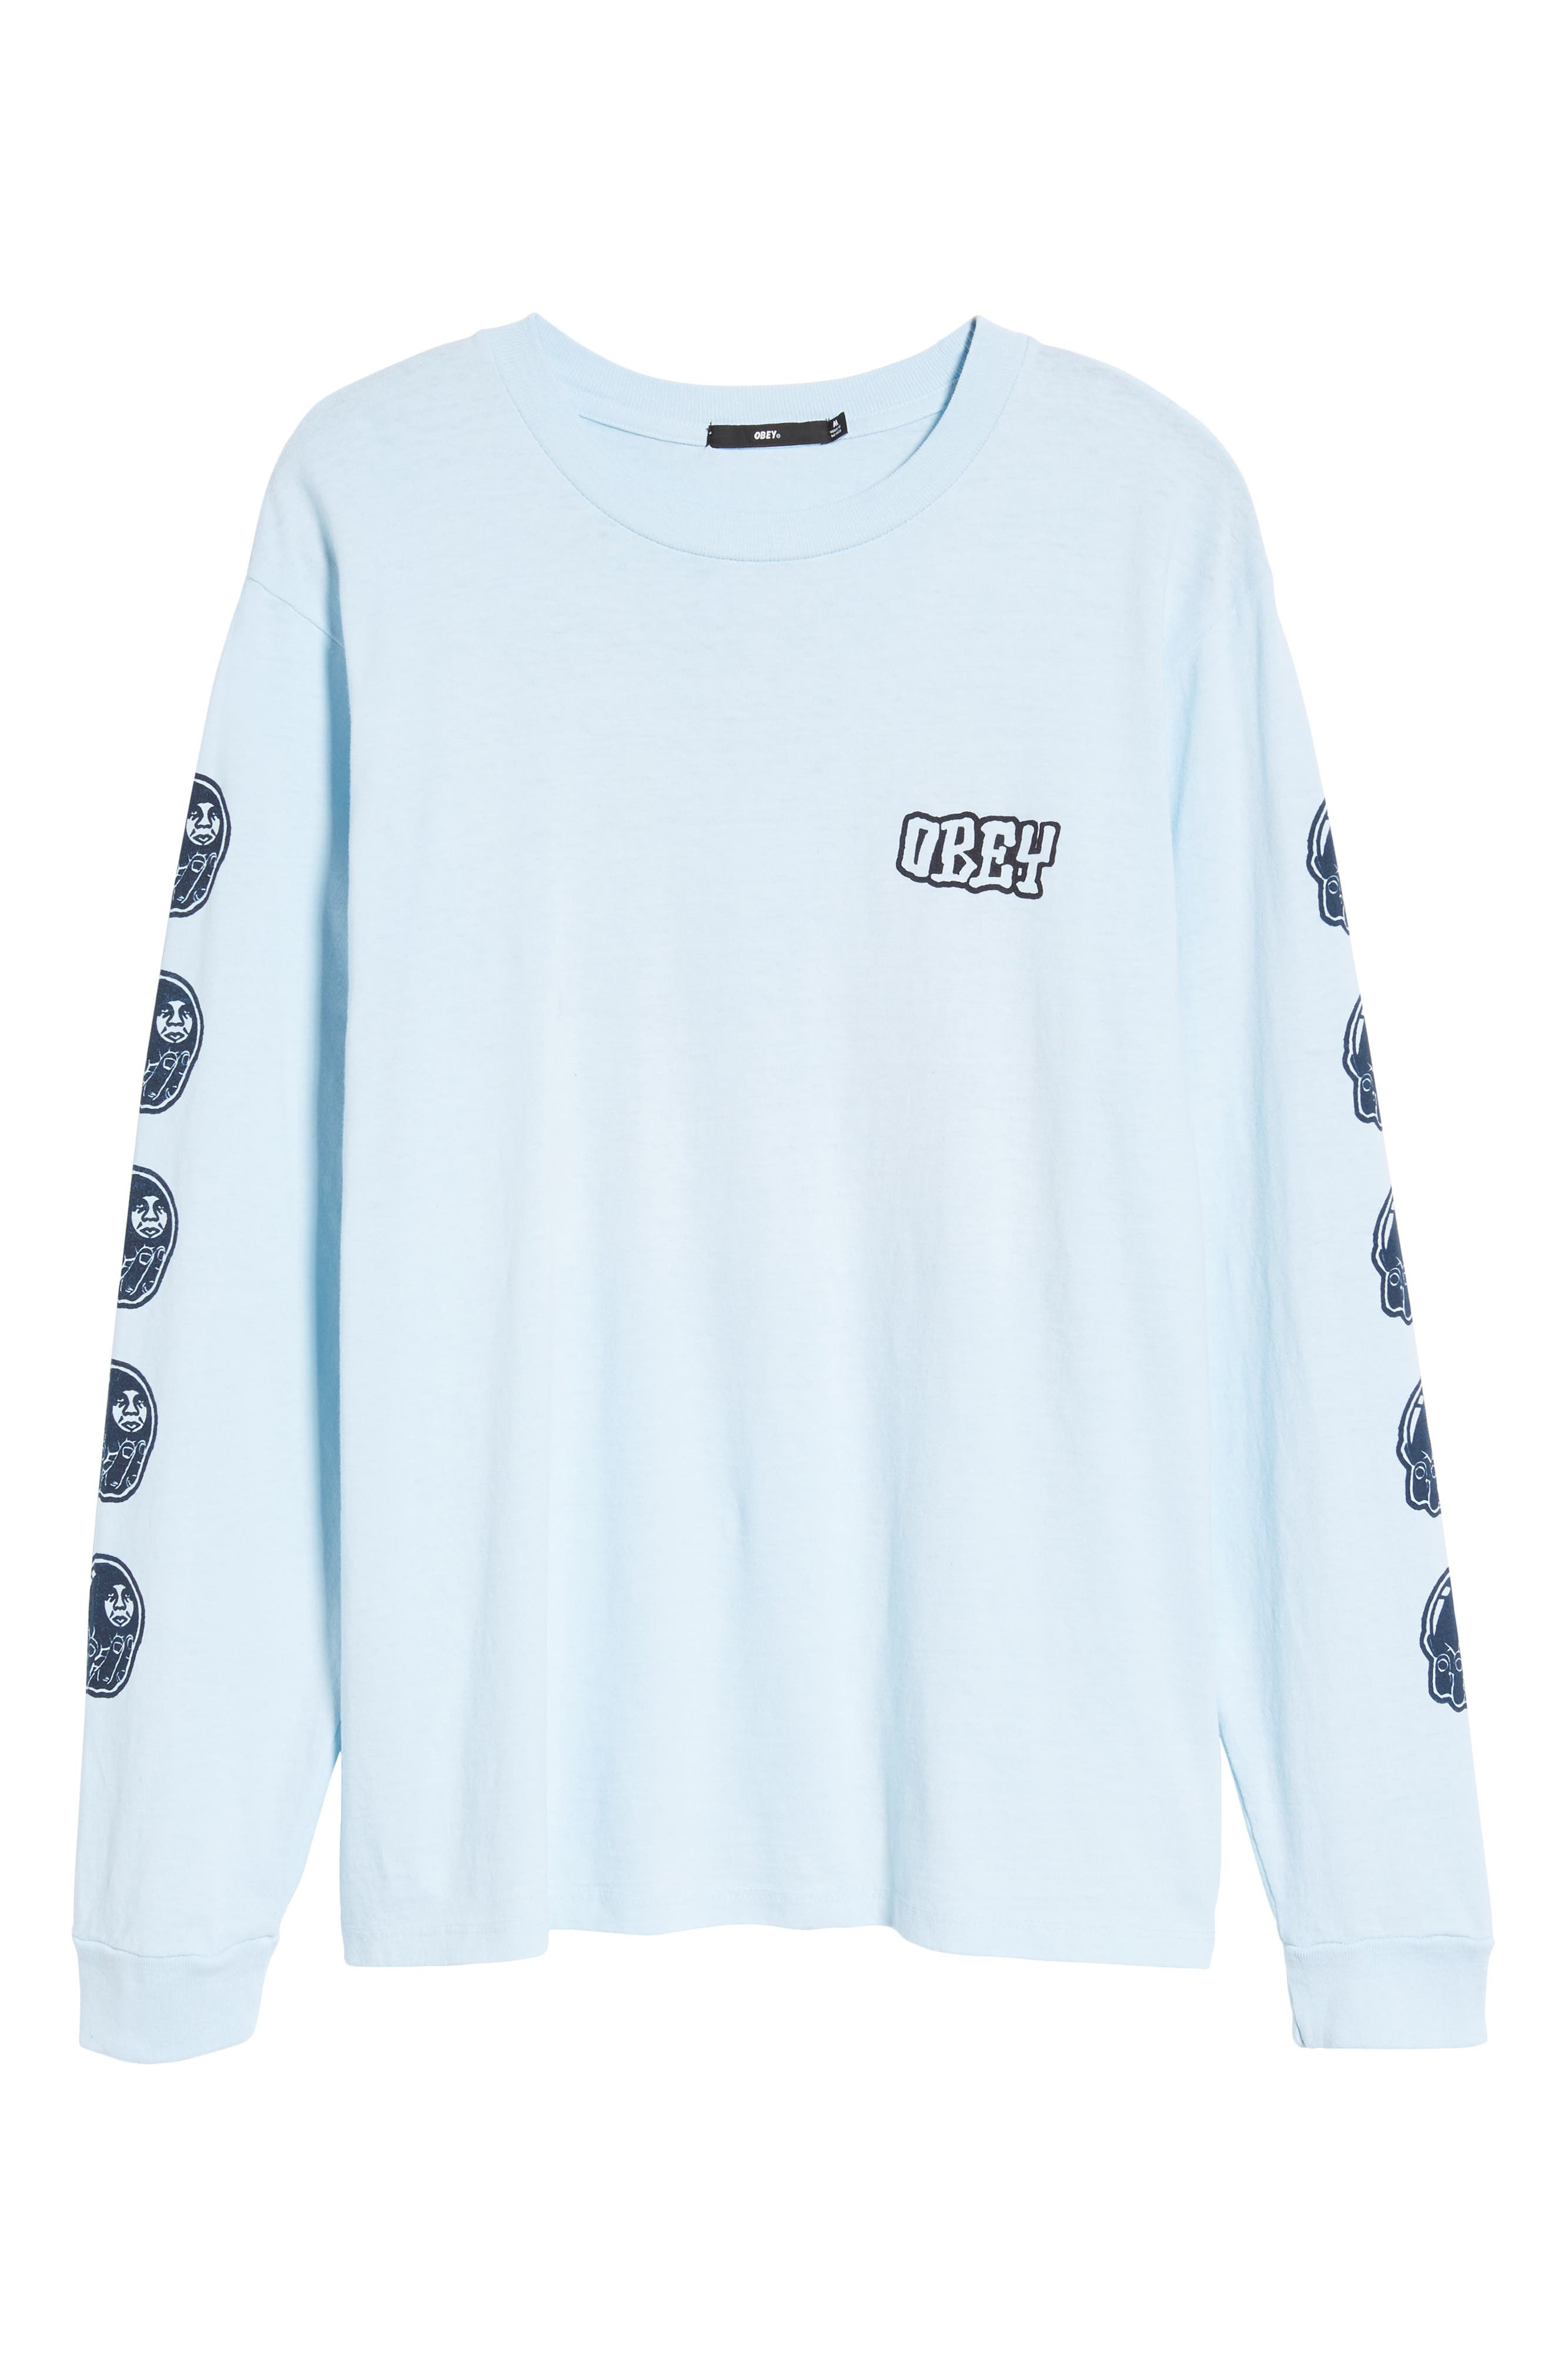 Unwritten Future Graphic T-Shirt,                             Alternate thumbnail 6, color,                             Dusty Blue